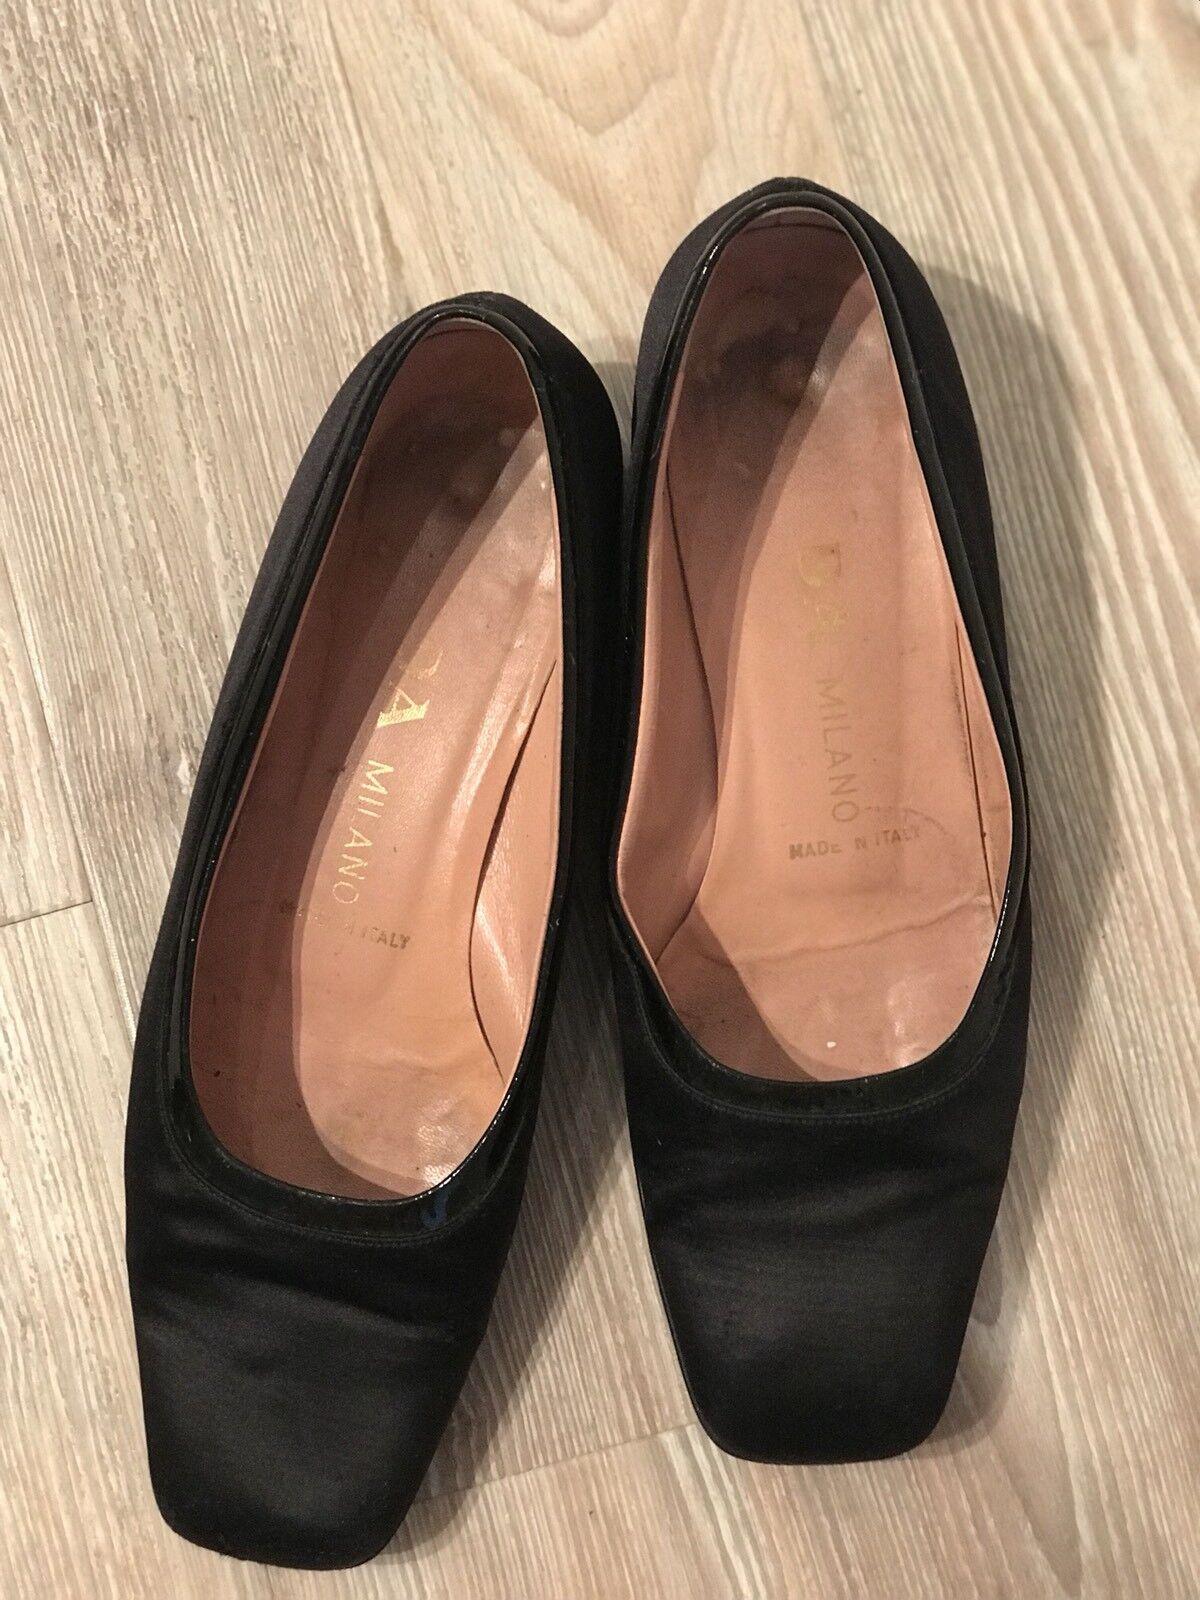 PRADA Schuhe, Schwarz, Schwarz, Schwarz, Größe 38 2a437f